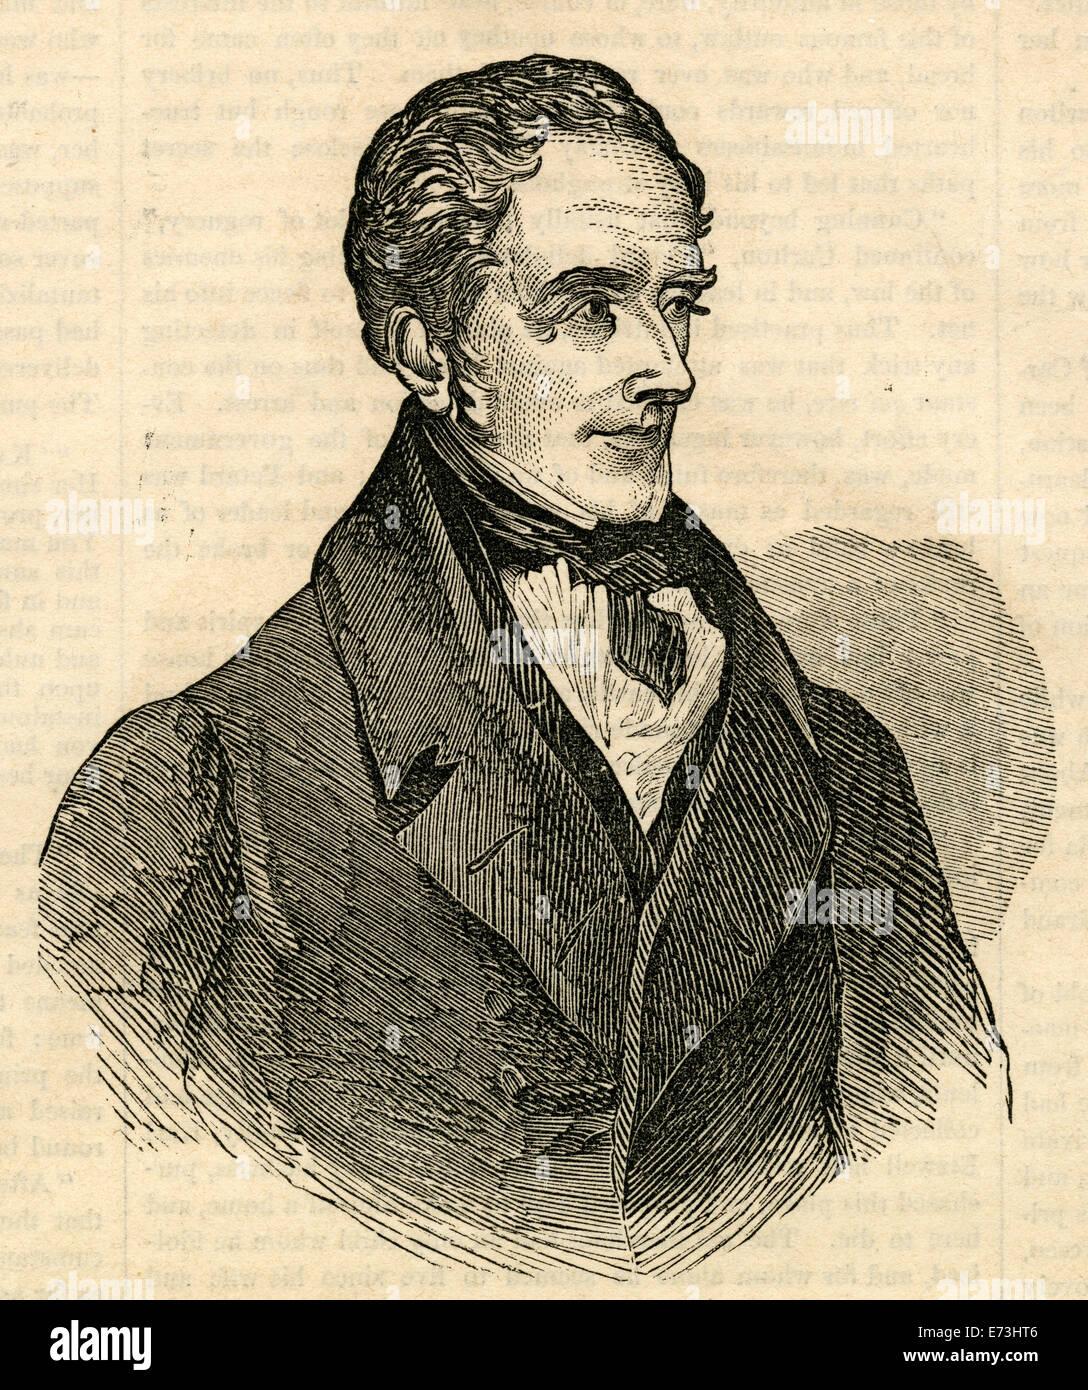 Antique 1854 engraving, portrait of Thomas Moore. Thomas Moore (1779-1852) was an Irish poet, singer, songwriter, - Stock Image